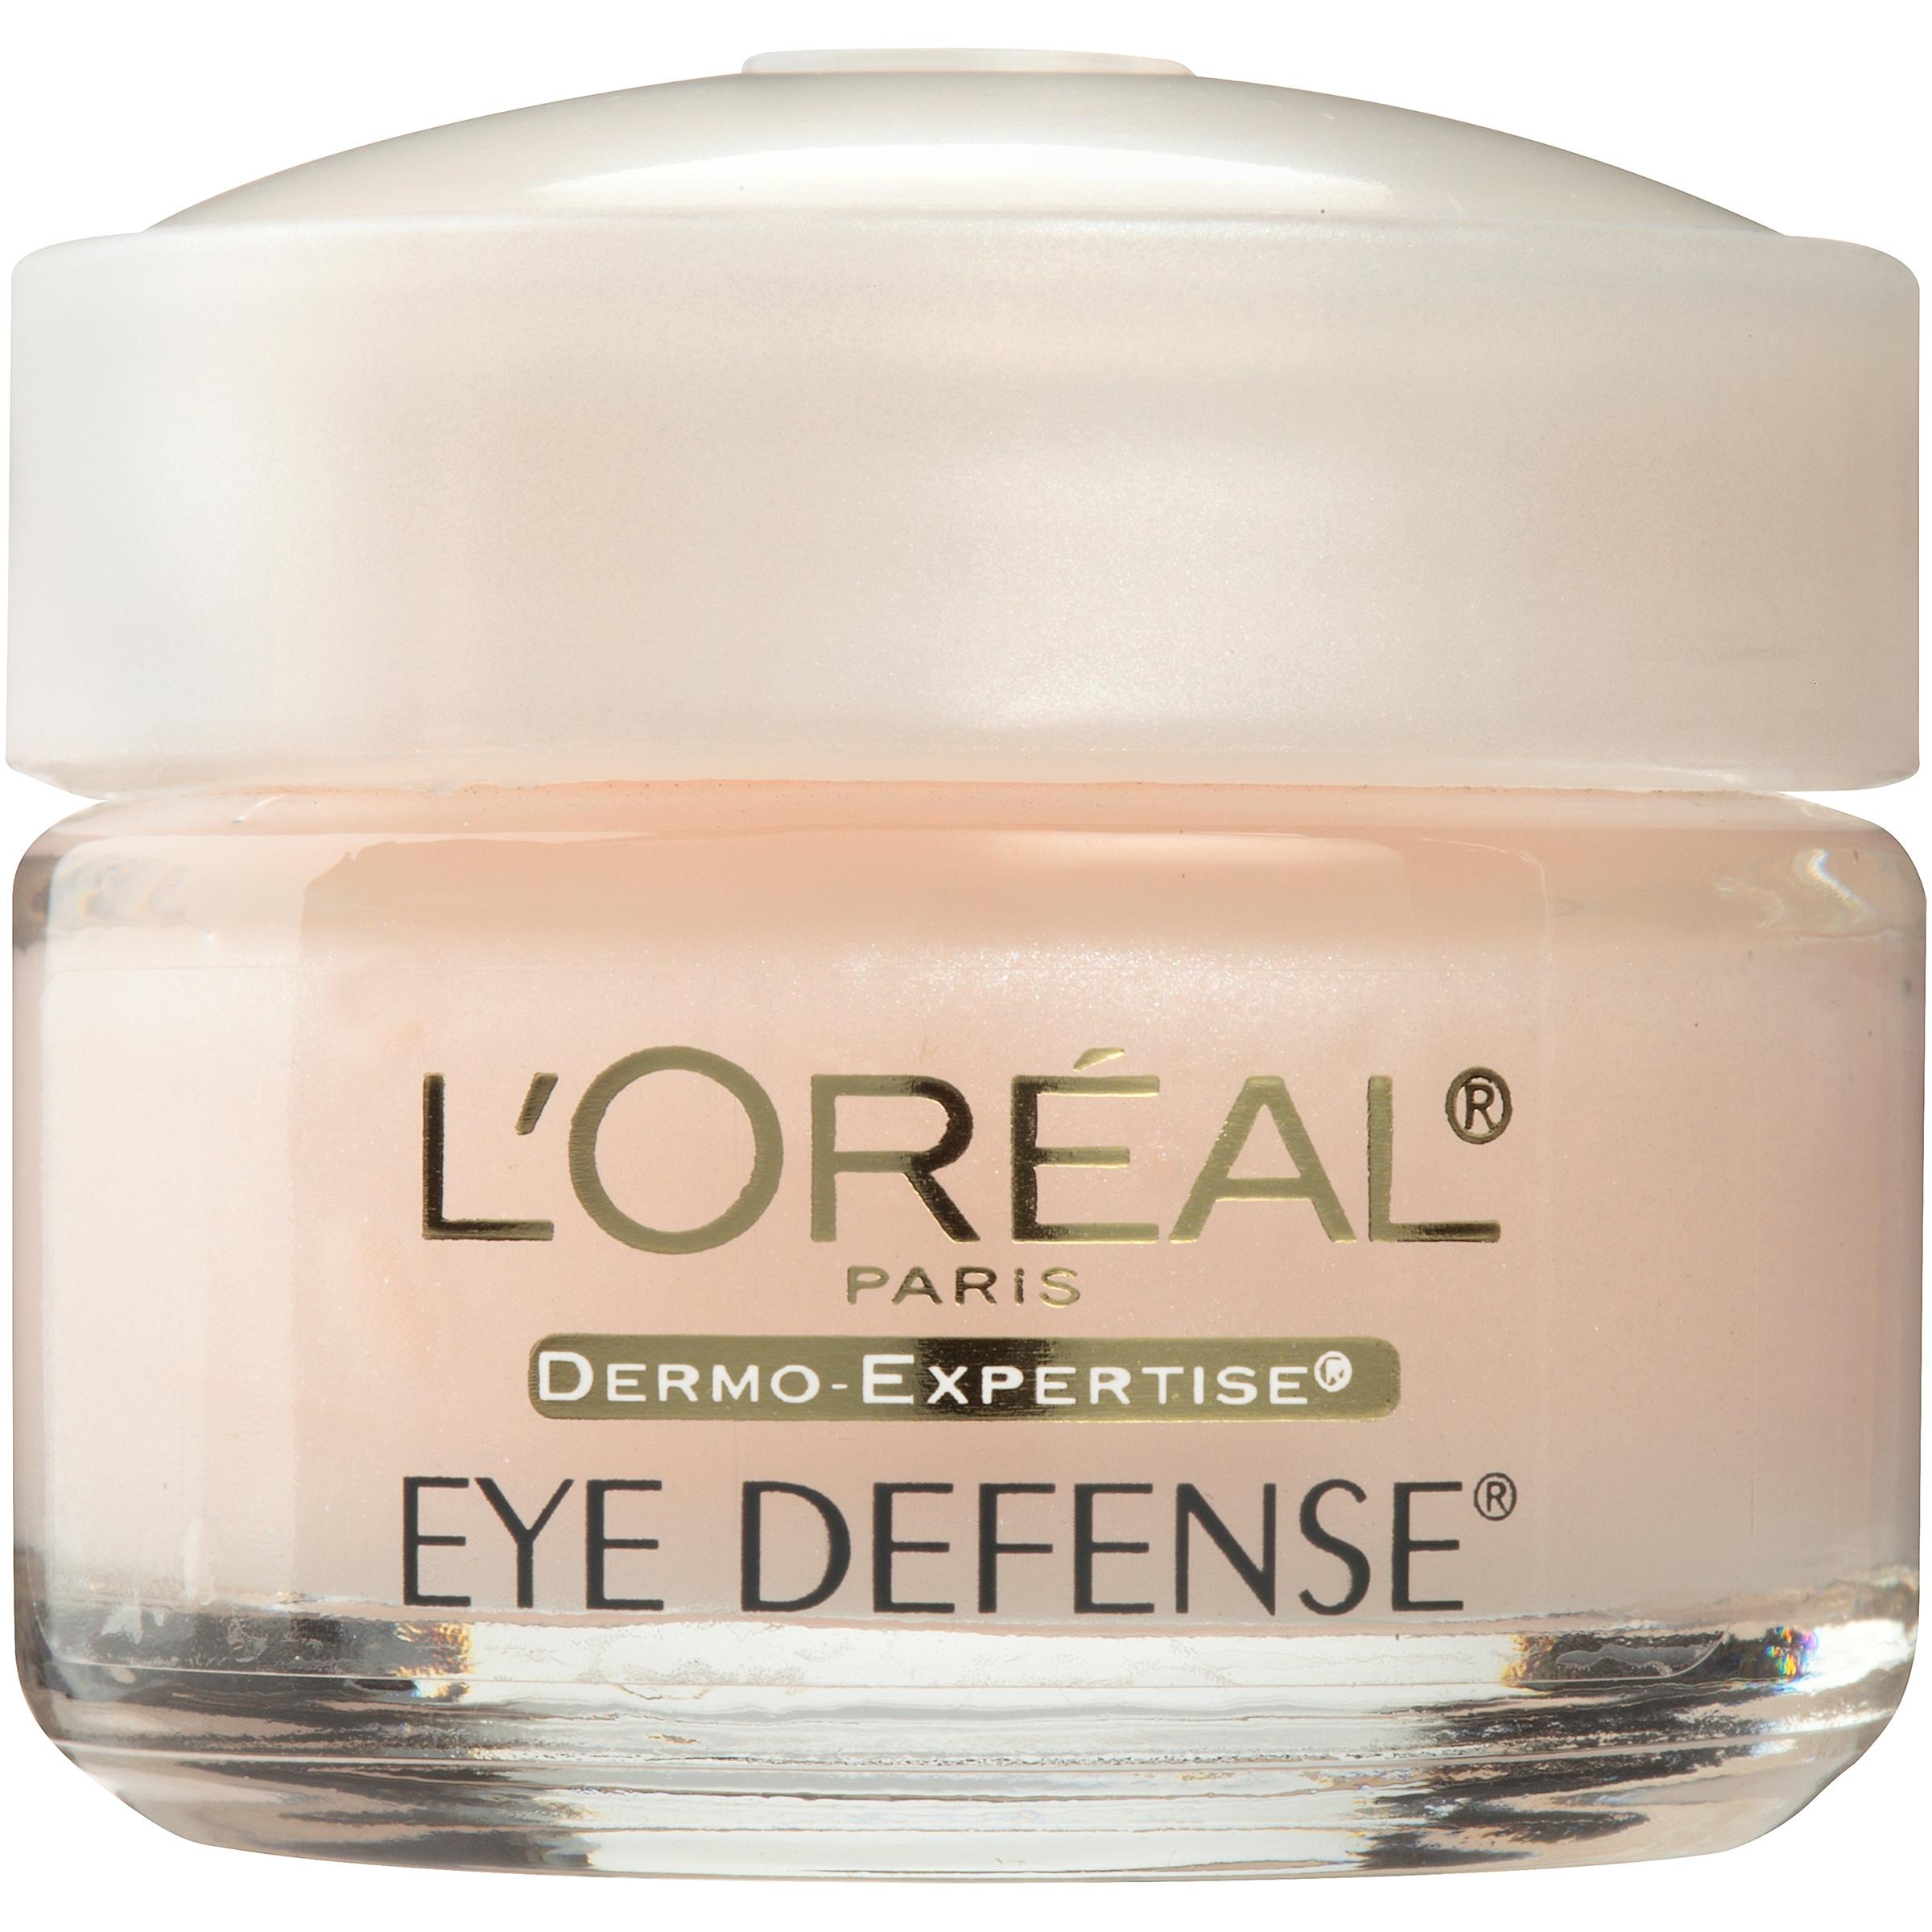 L'Oreal Paris Dermo Expertise Eye Defense Eye Cream